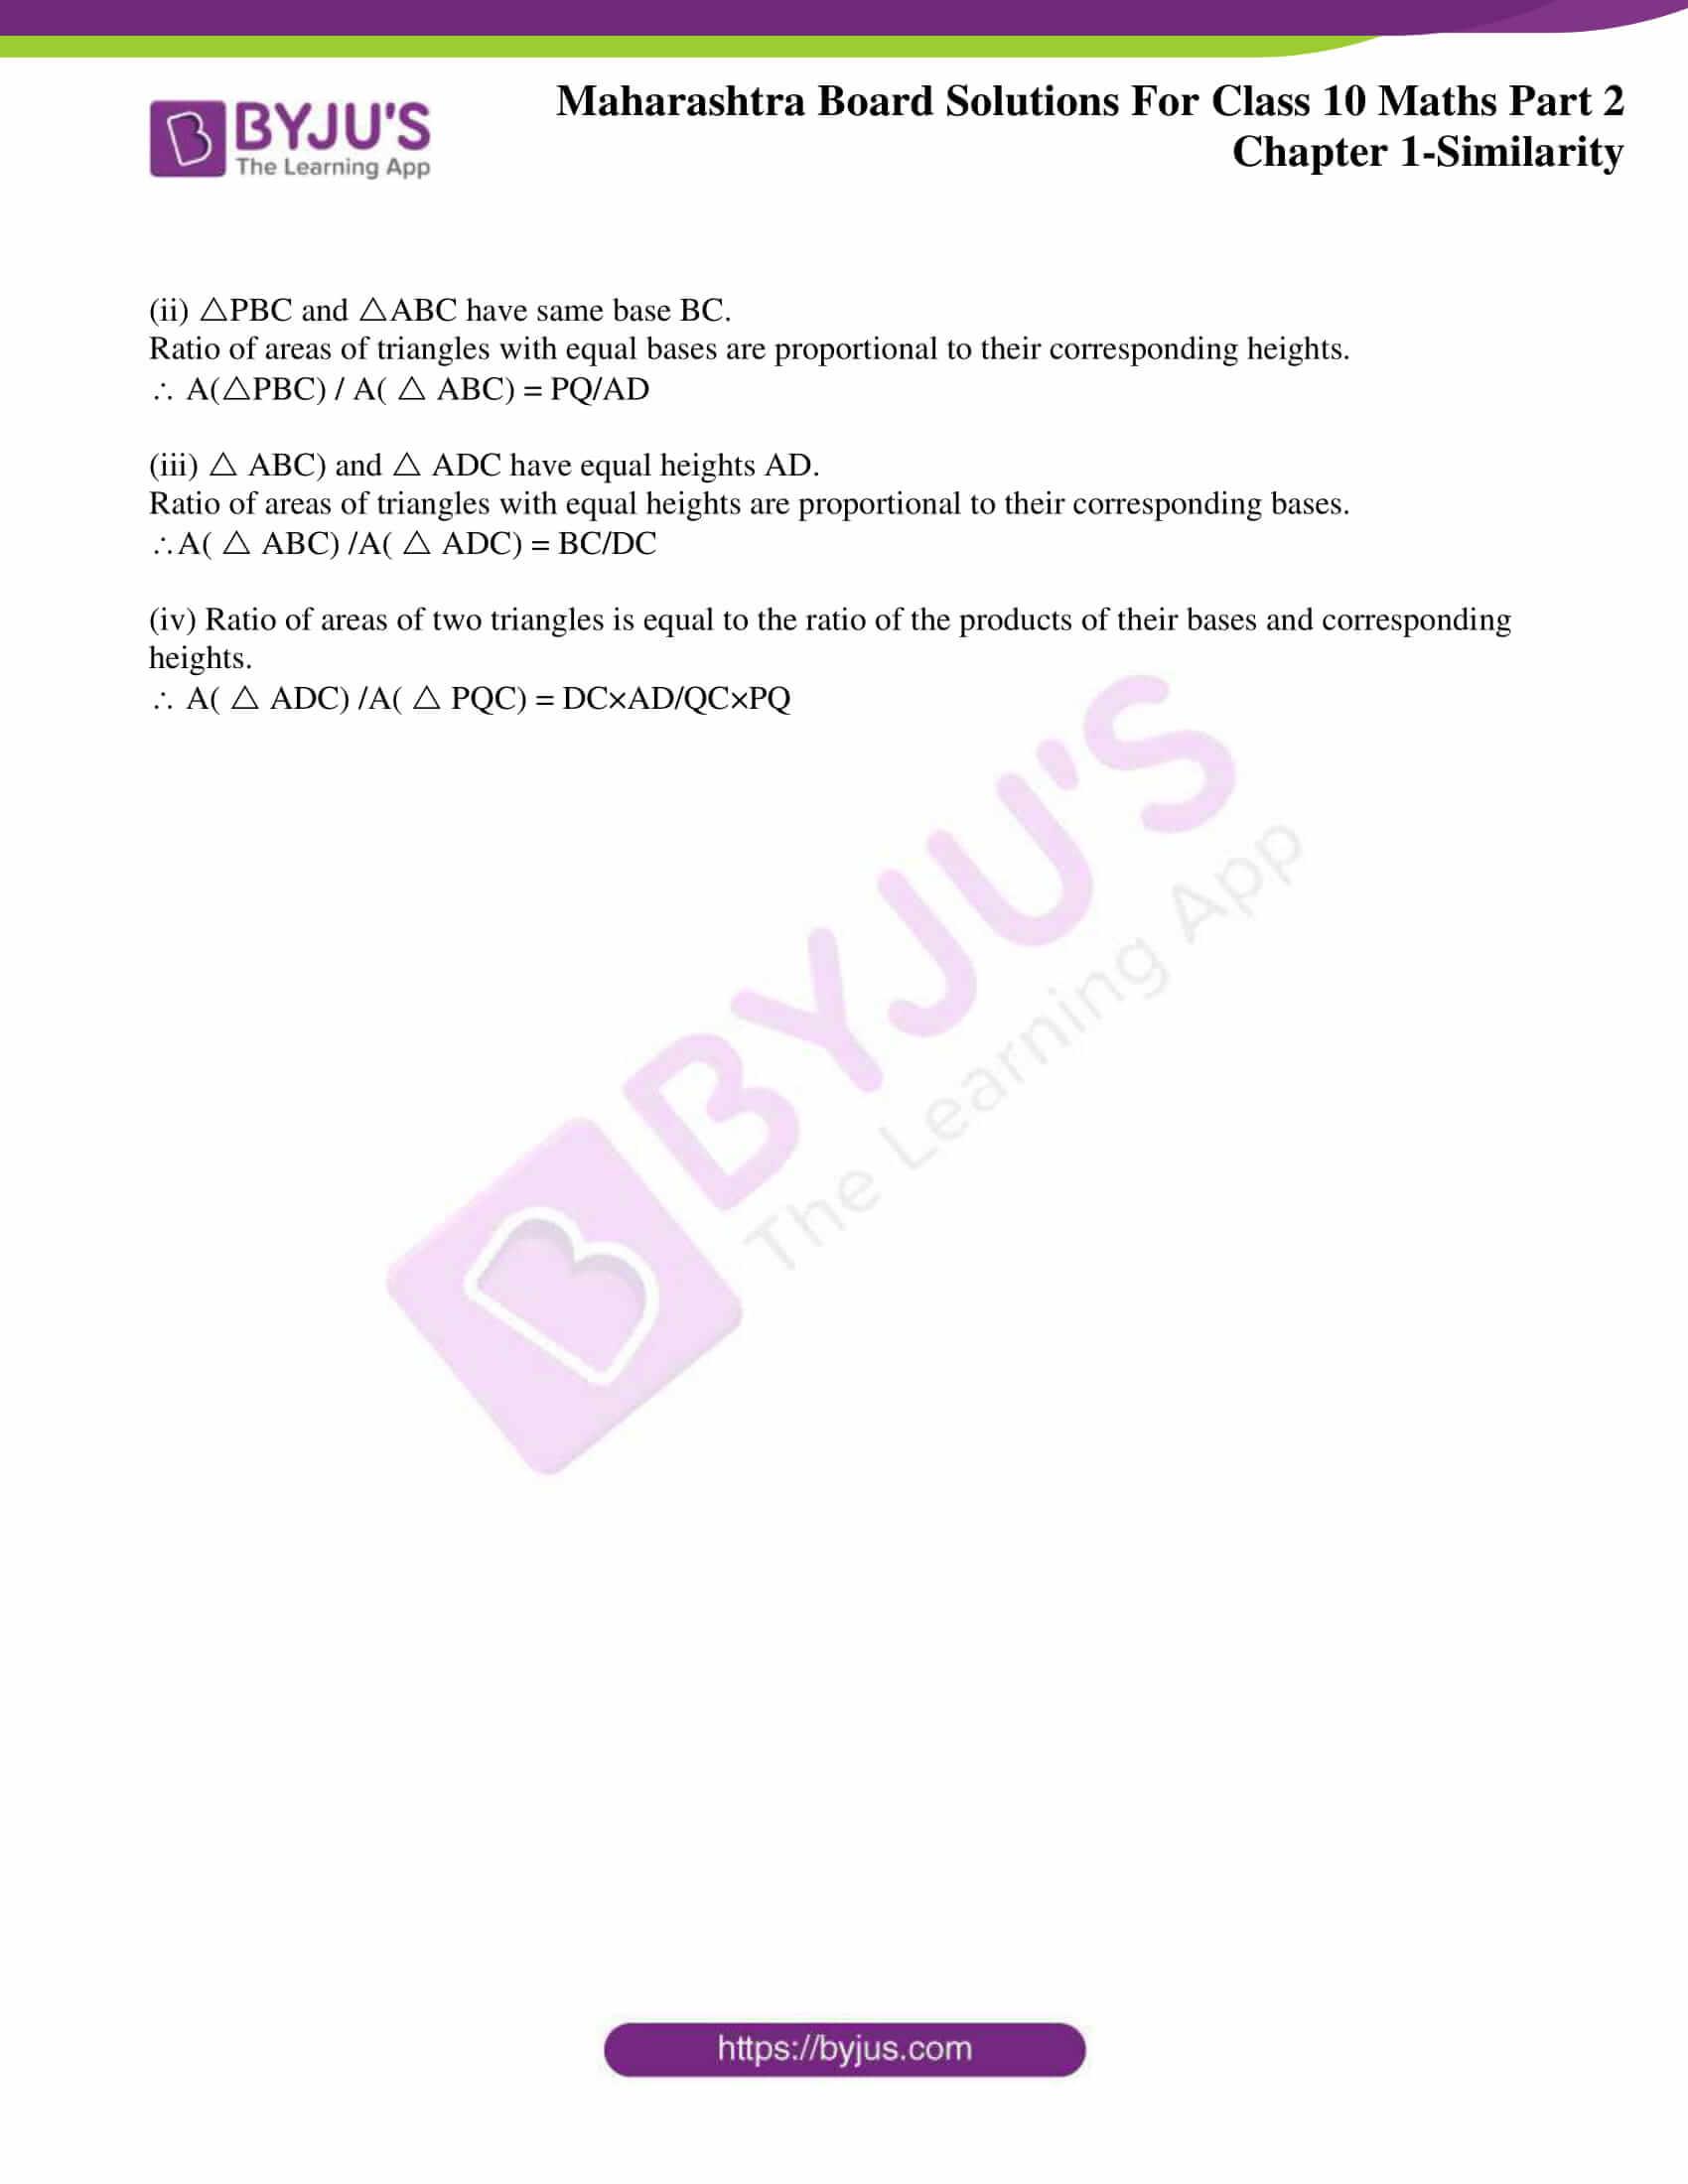 msbshse sol class 10 maths part 2 chapter 1 04